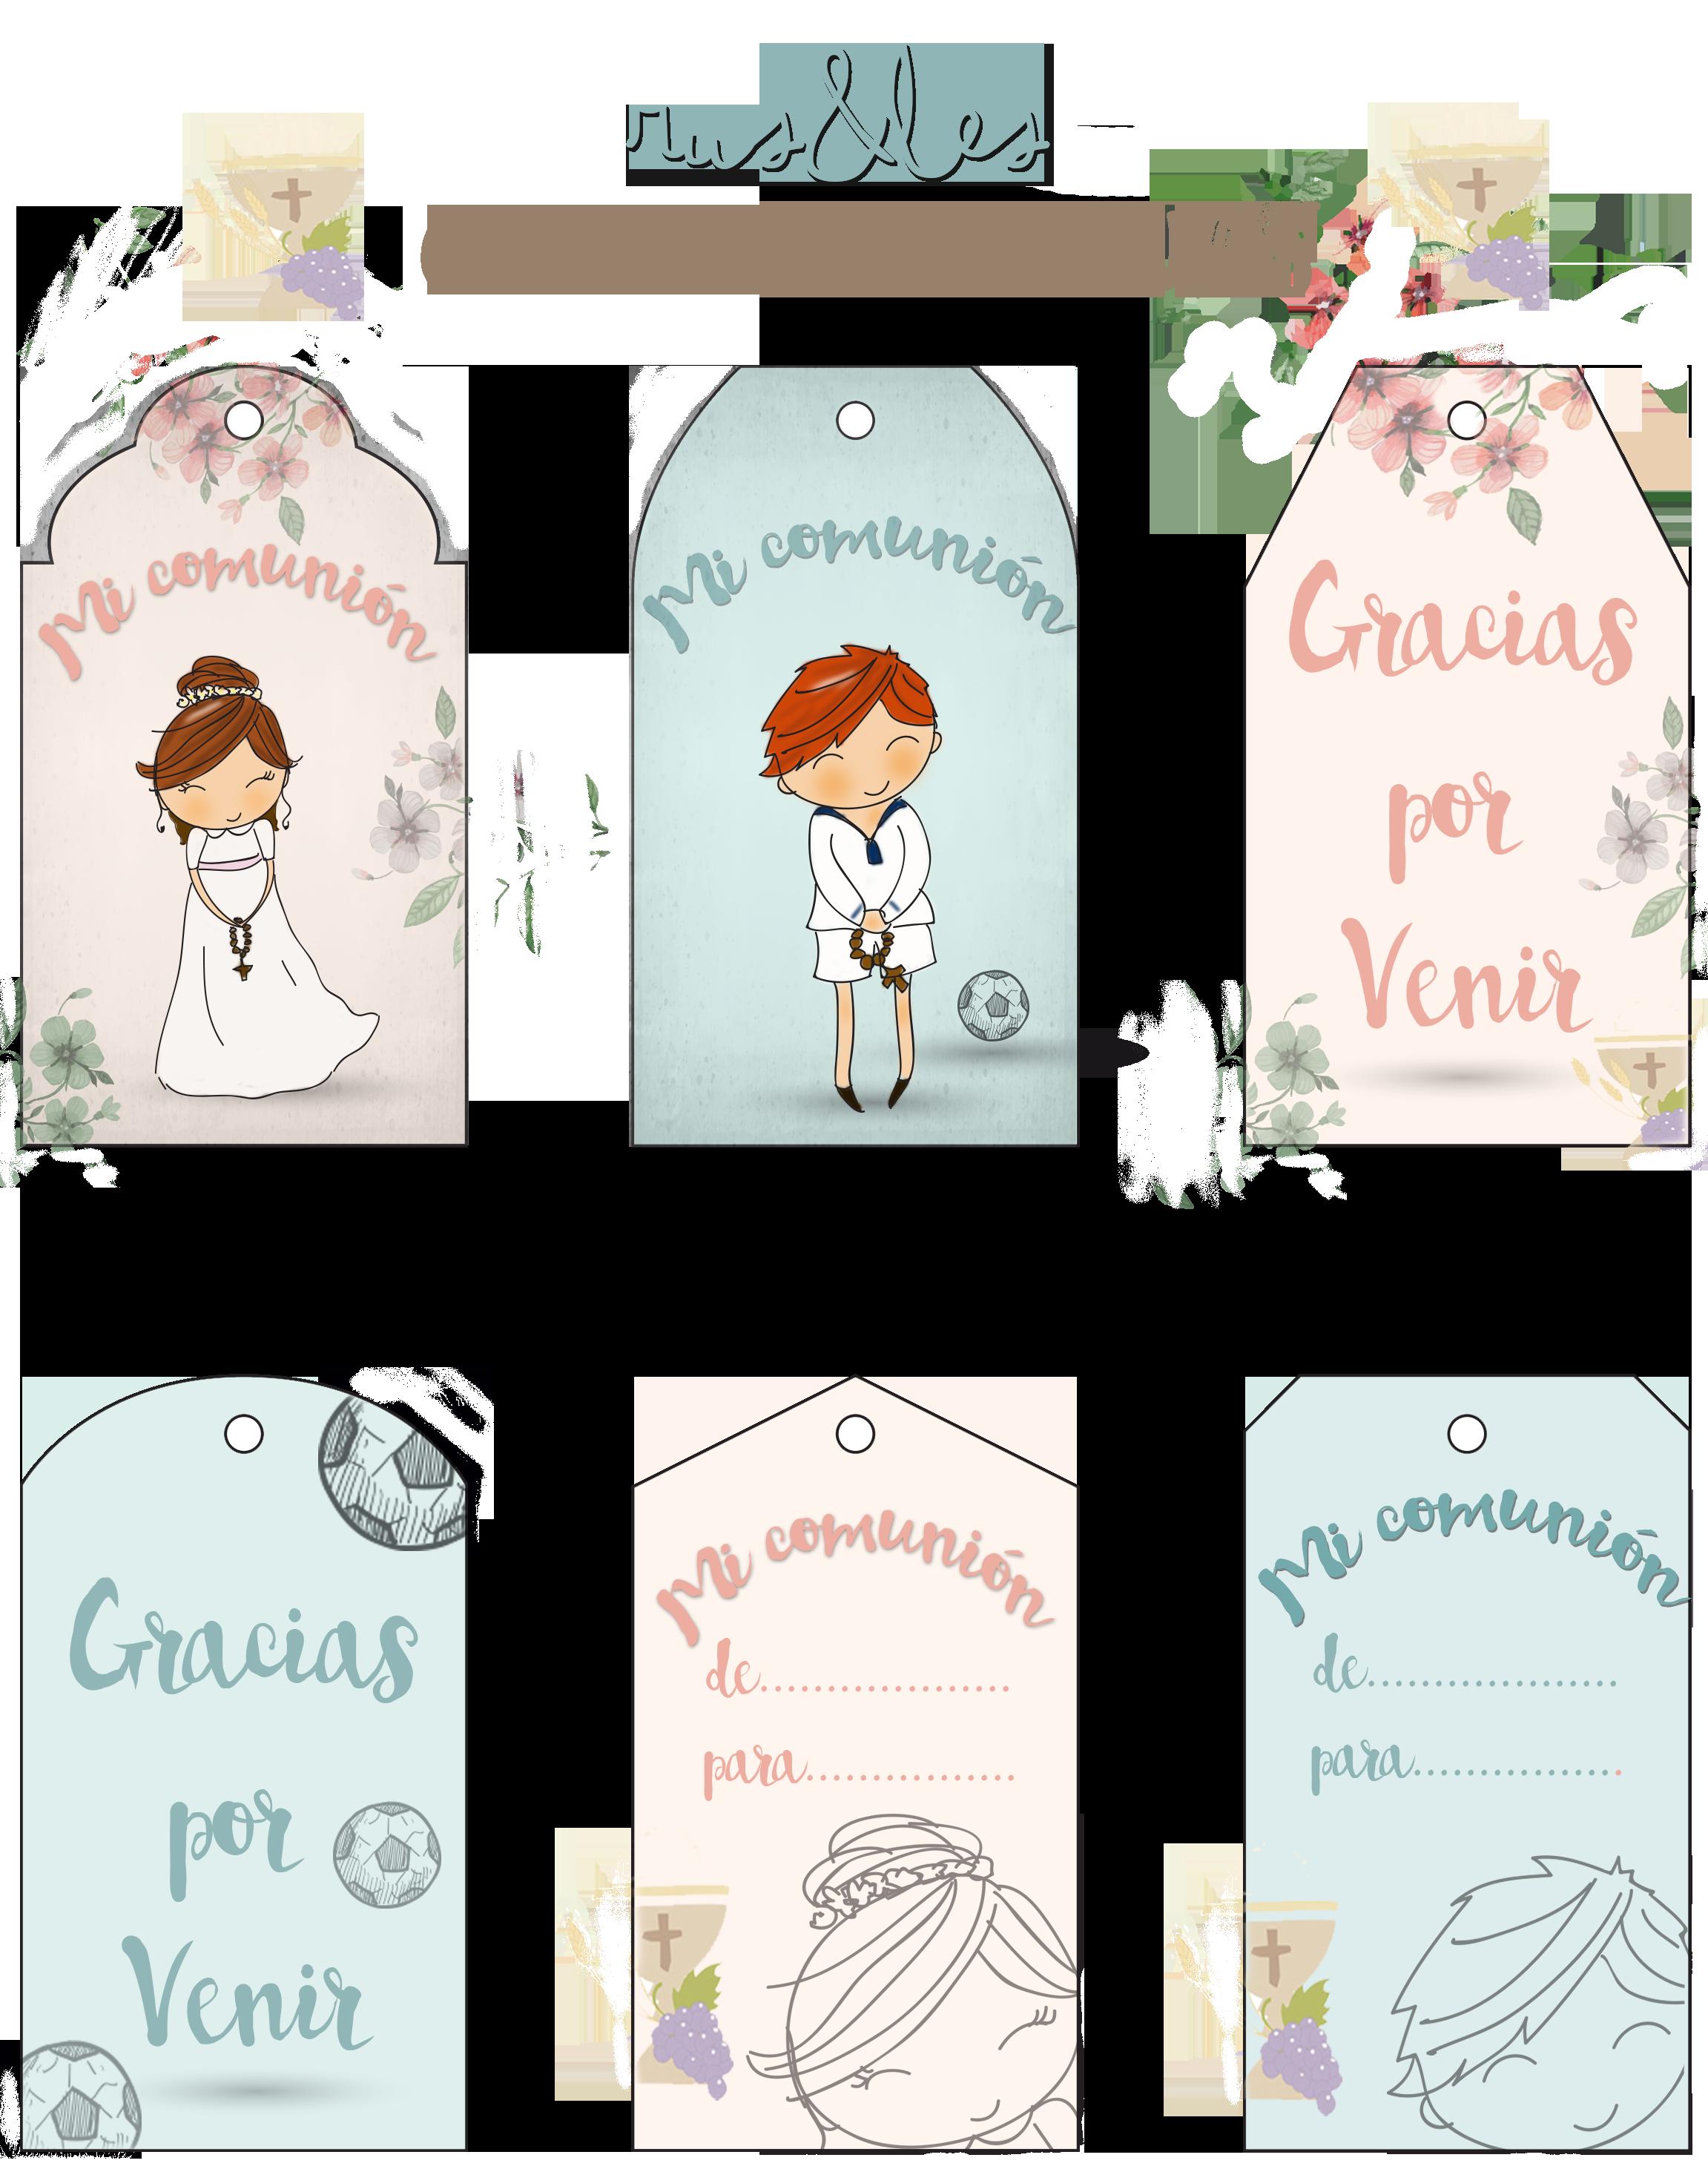 Etiquetas primera comuni n descargatelas gratis en nuestro blog bautizo etiquetas comunion - Etiquetas comunion para imprimir en casa gratis ...